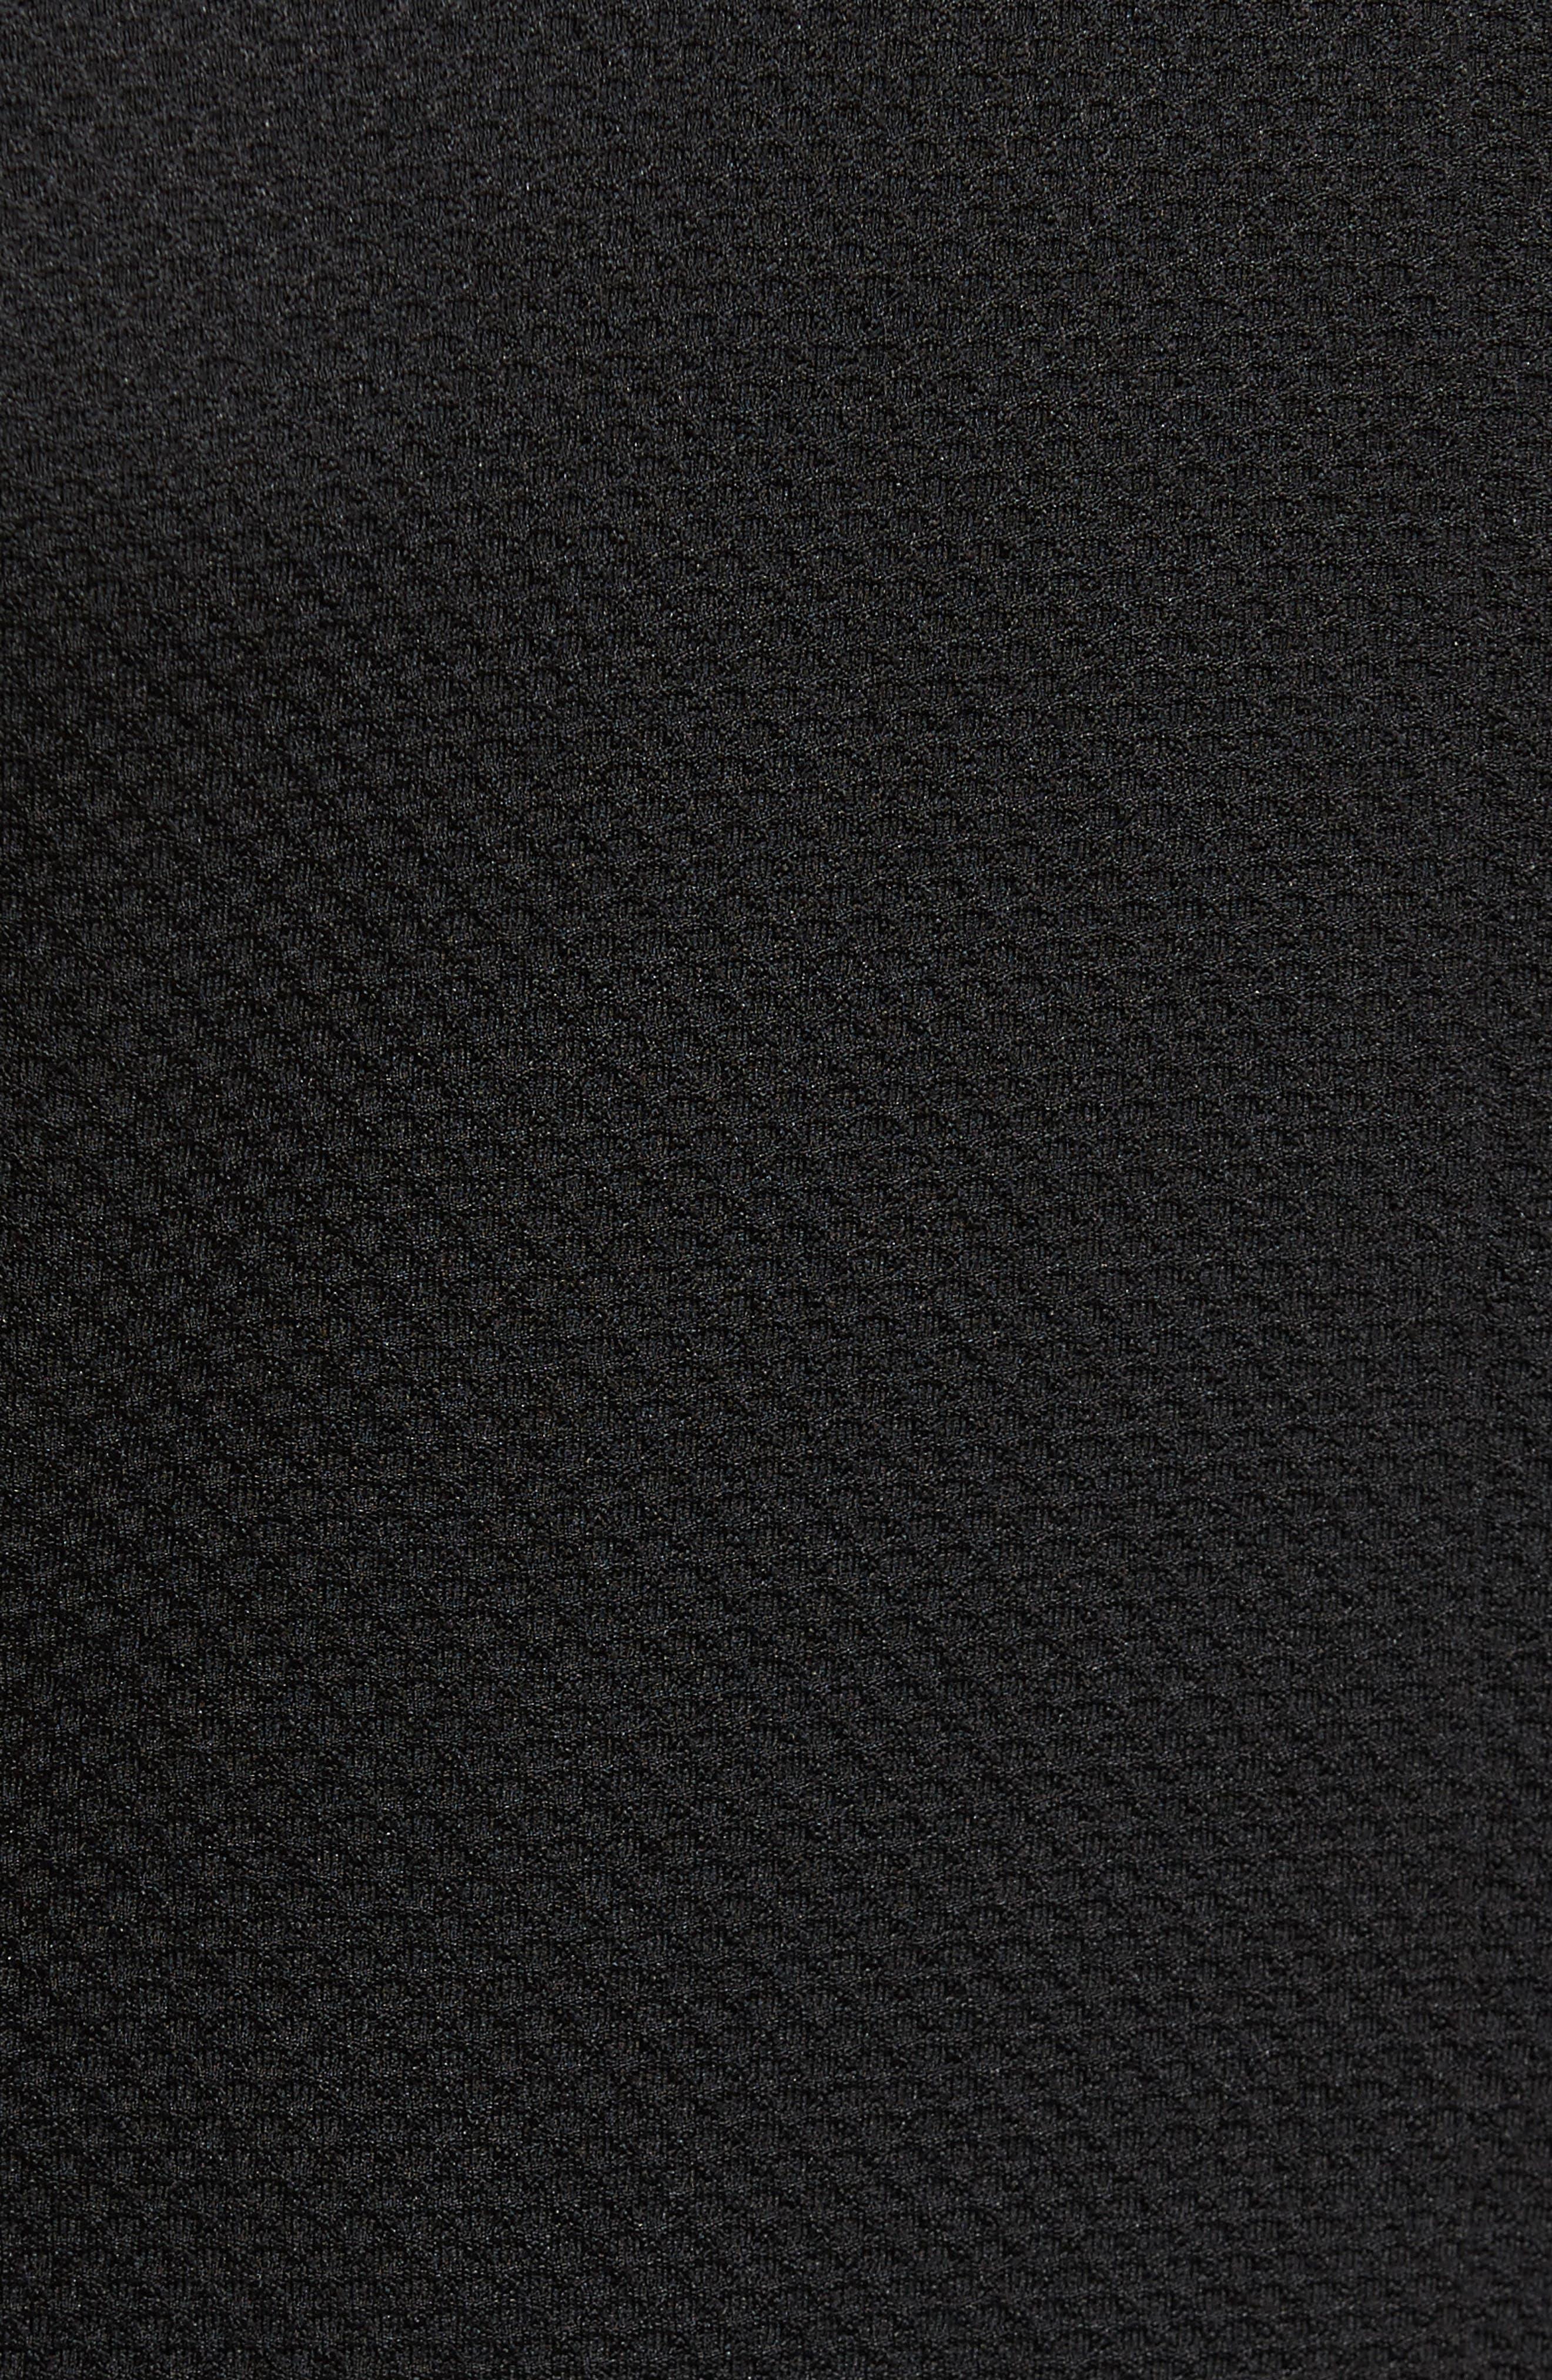 VINCE CAMUTO, Slim Fit Stretch Knit Sport Coat, Alternate thumbnail 6, color, BLACK